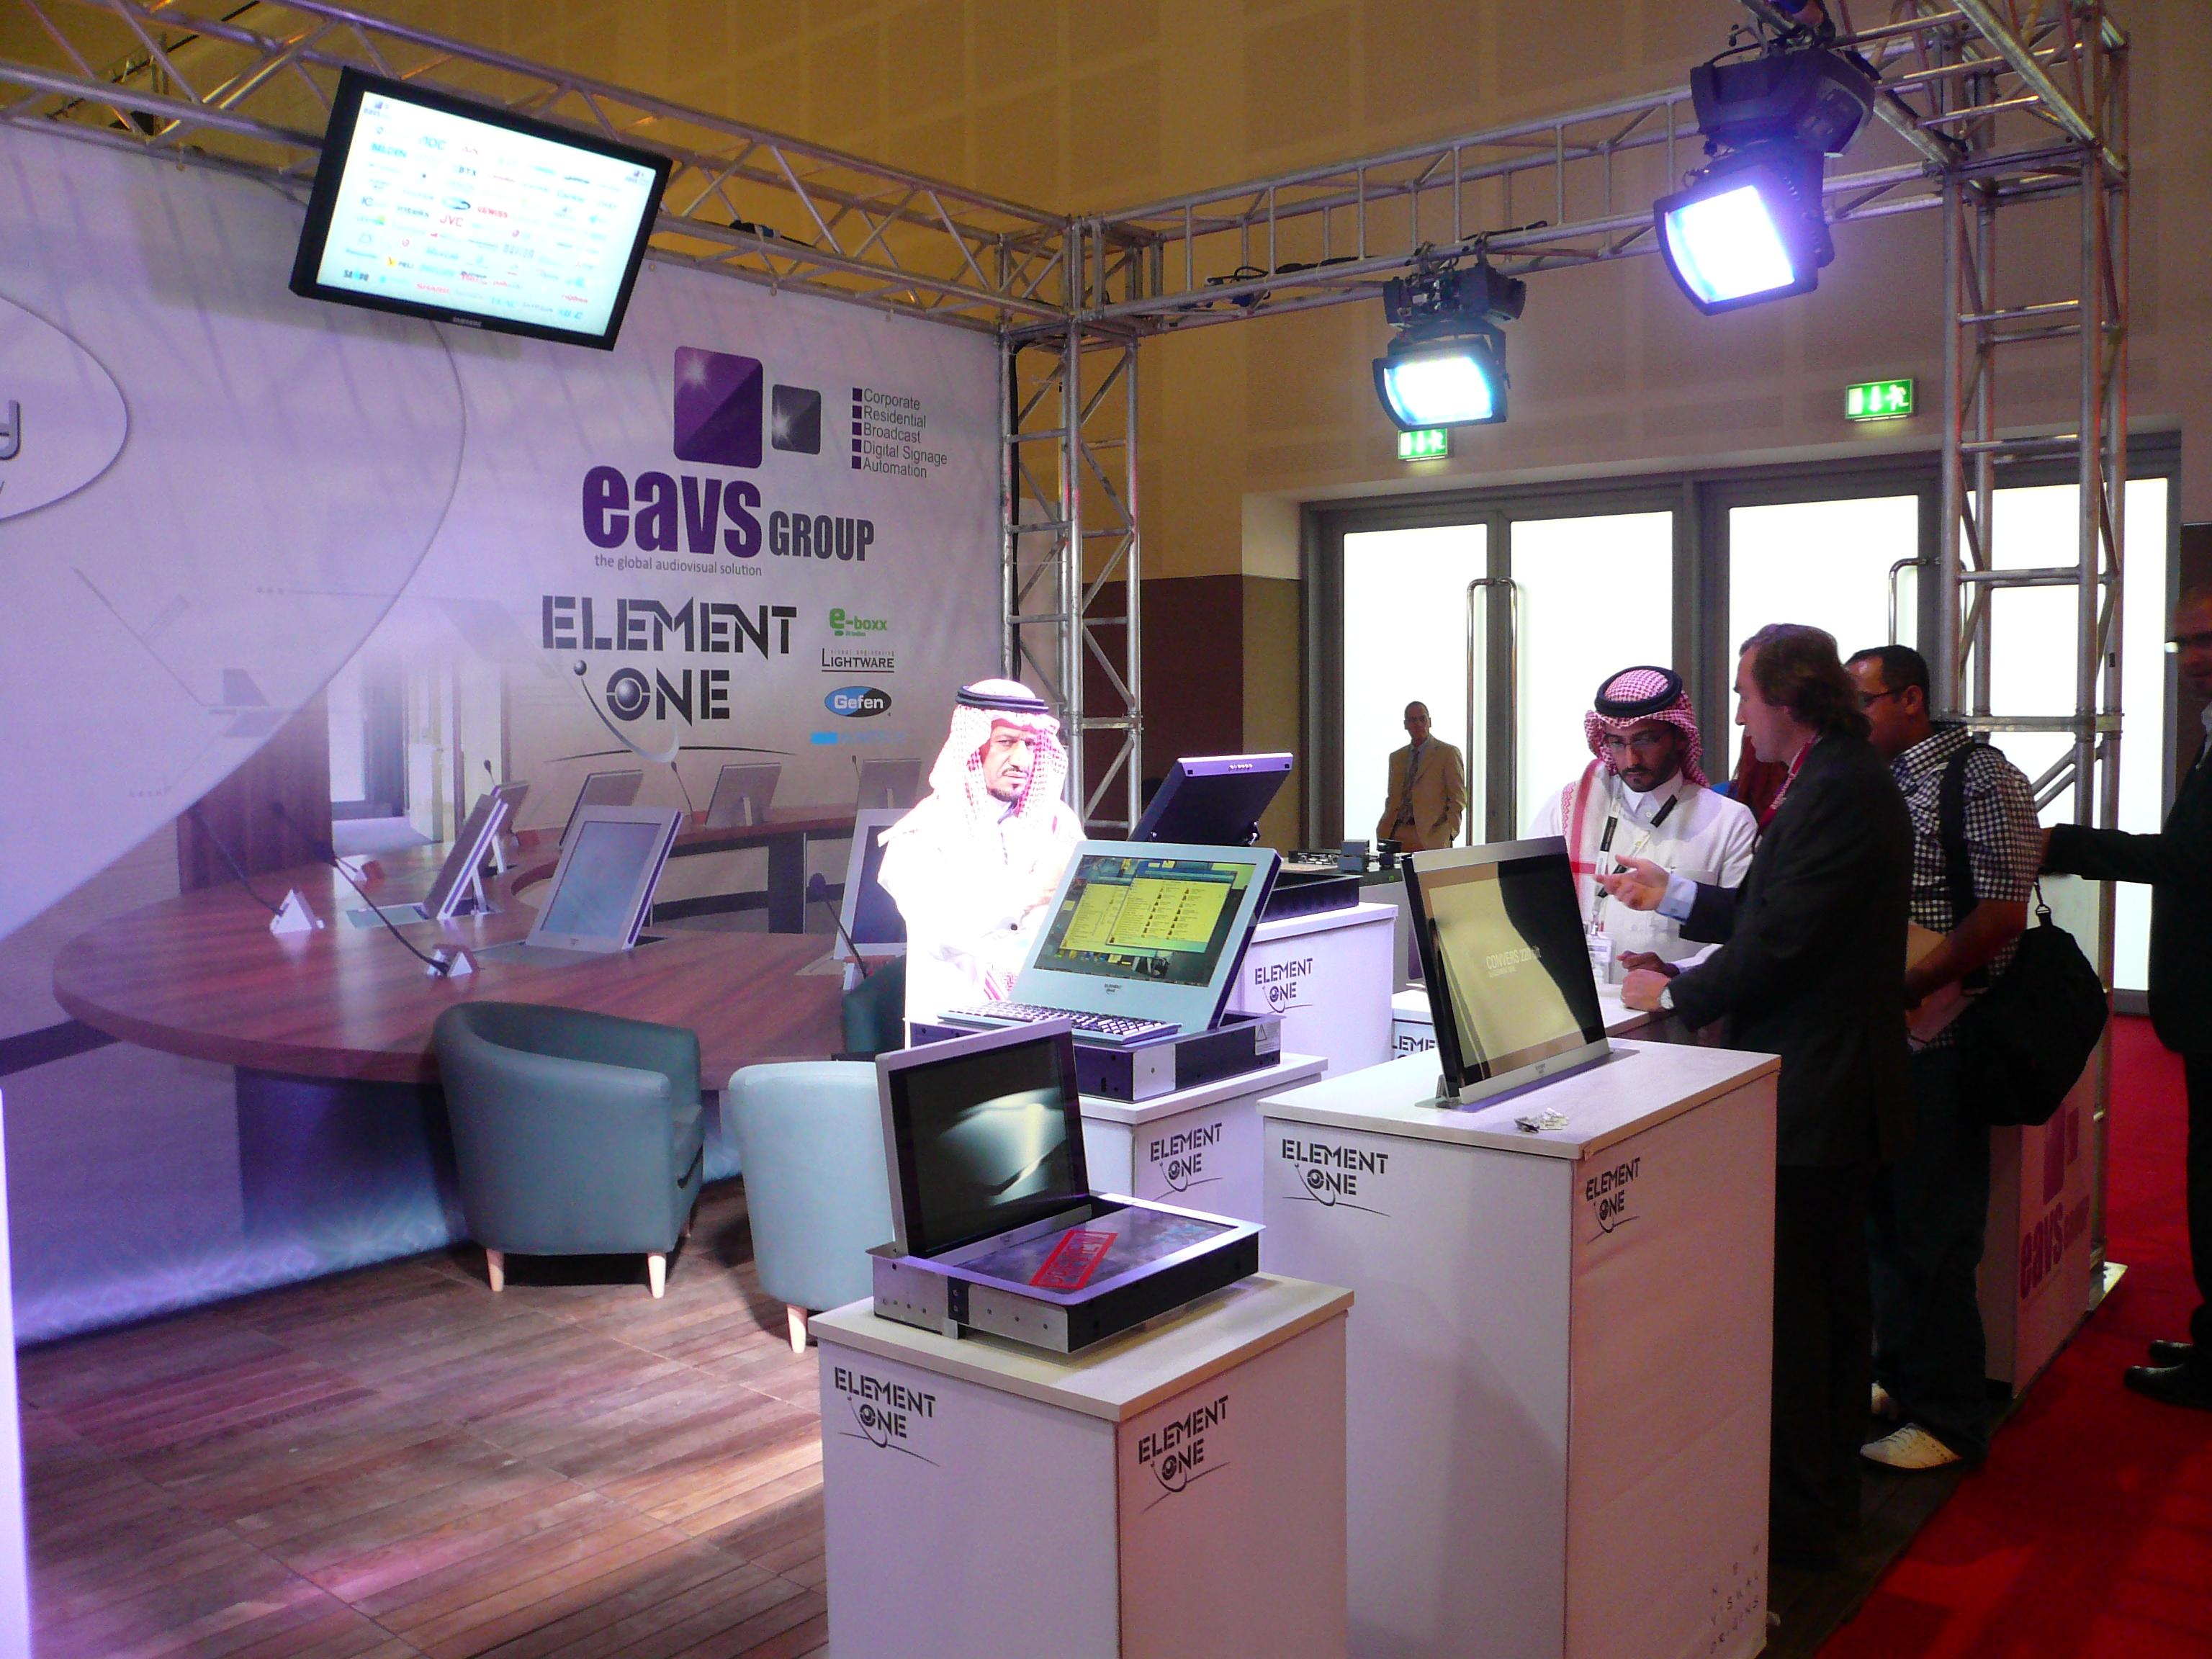 EAVS Infocomm MEA 2012 Dubaï